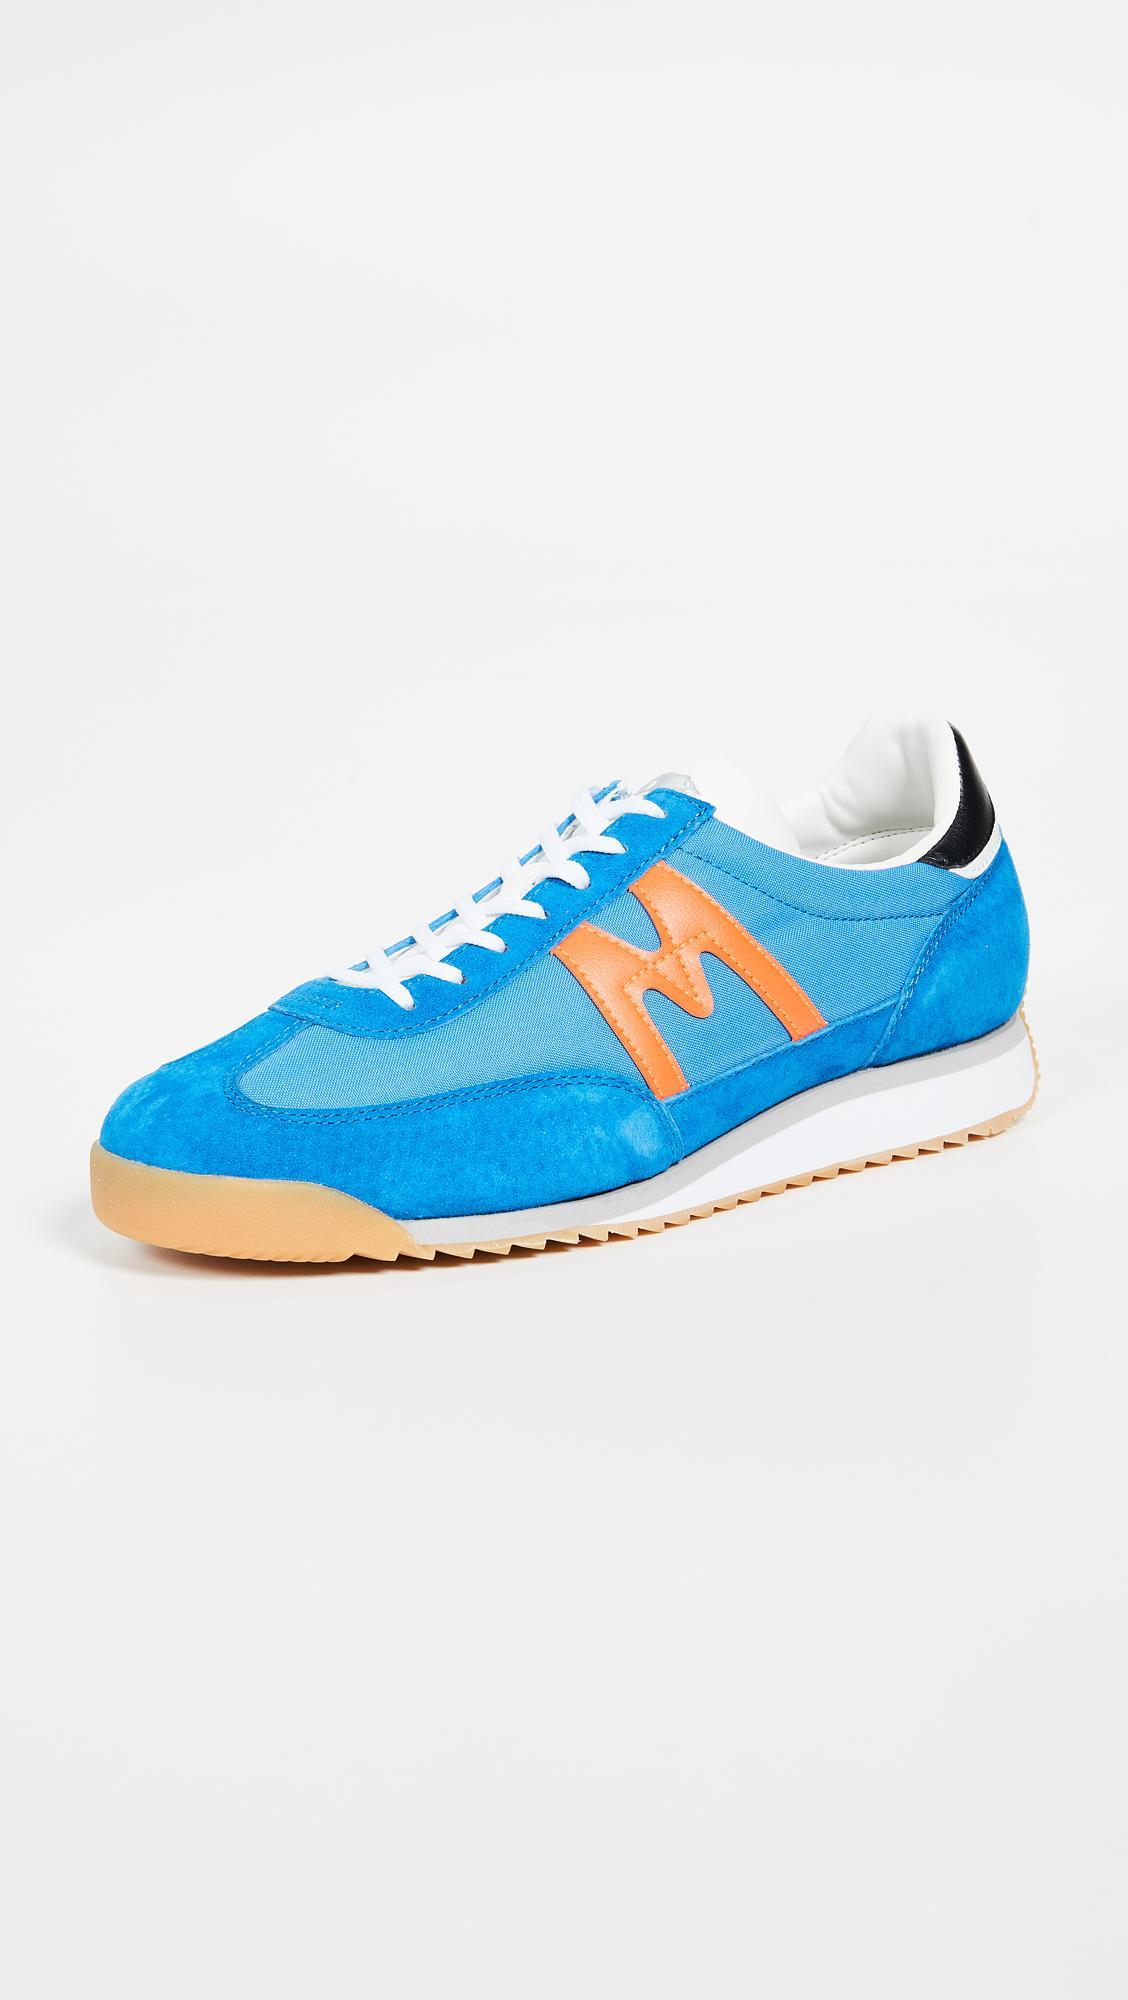 b4c5bd7195a Karhu Championair Sneakers in Blue for Men - Lyst